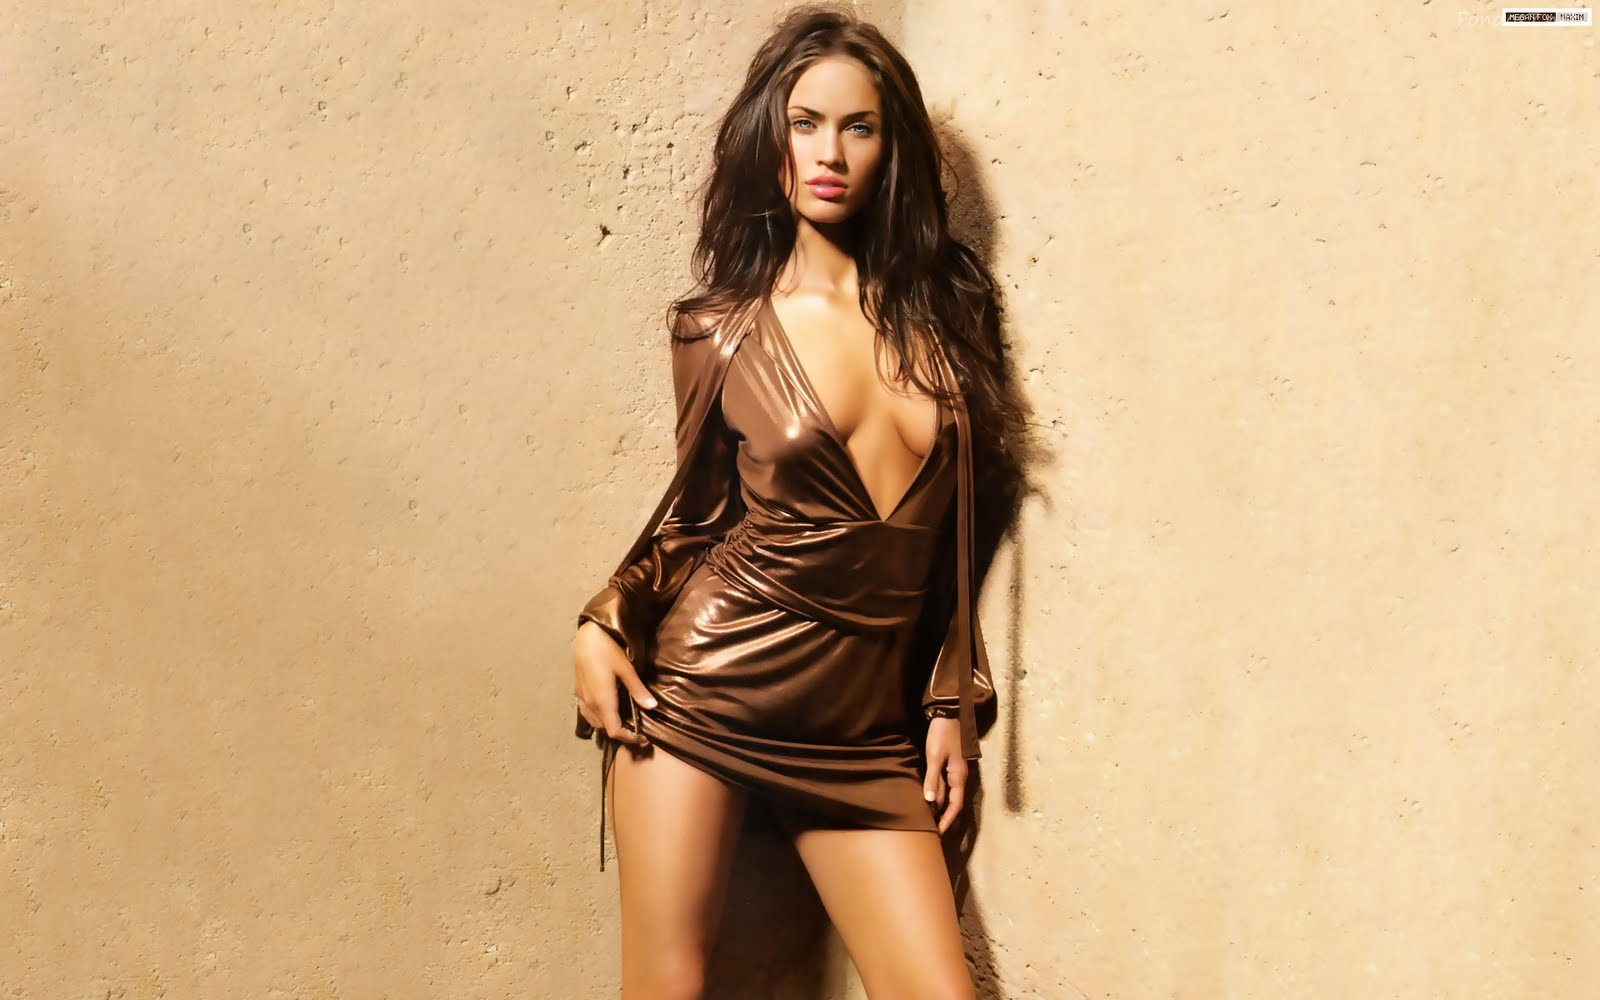 http://3.bp.blogspot.com/-ZNnjo74nibE/ThNYC-F2gII/AAAAAAAALDA/99v2w9pDpdU/s1600/Megan-Fox.jpeg